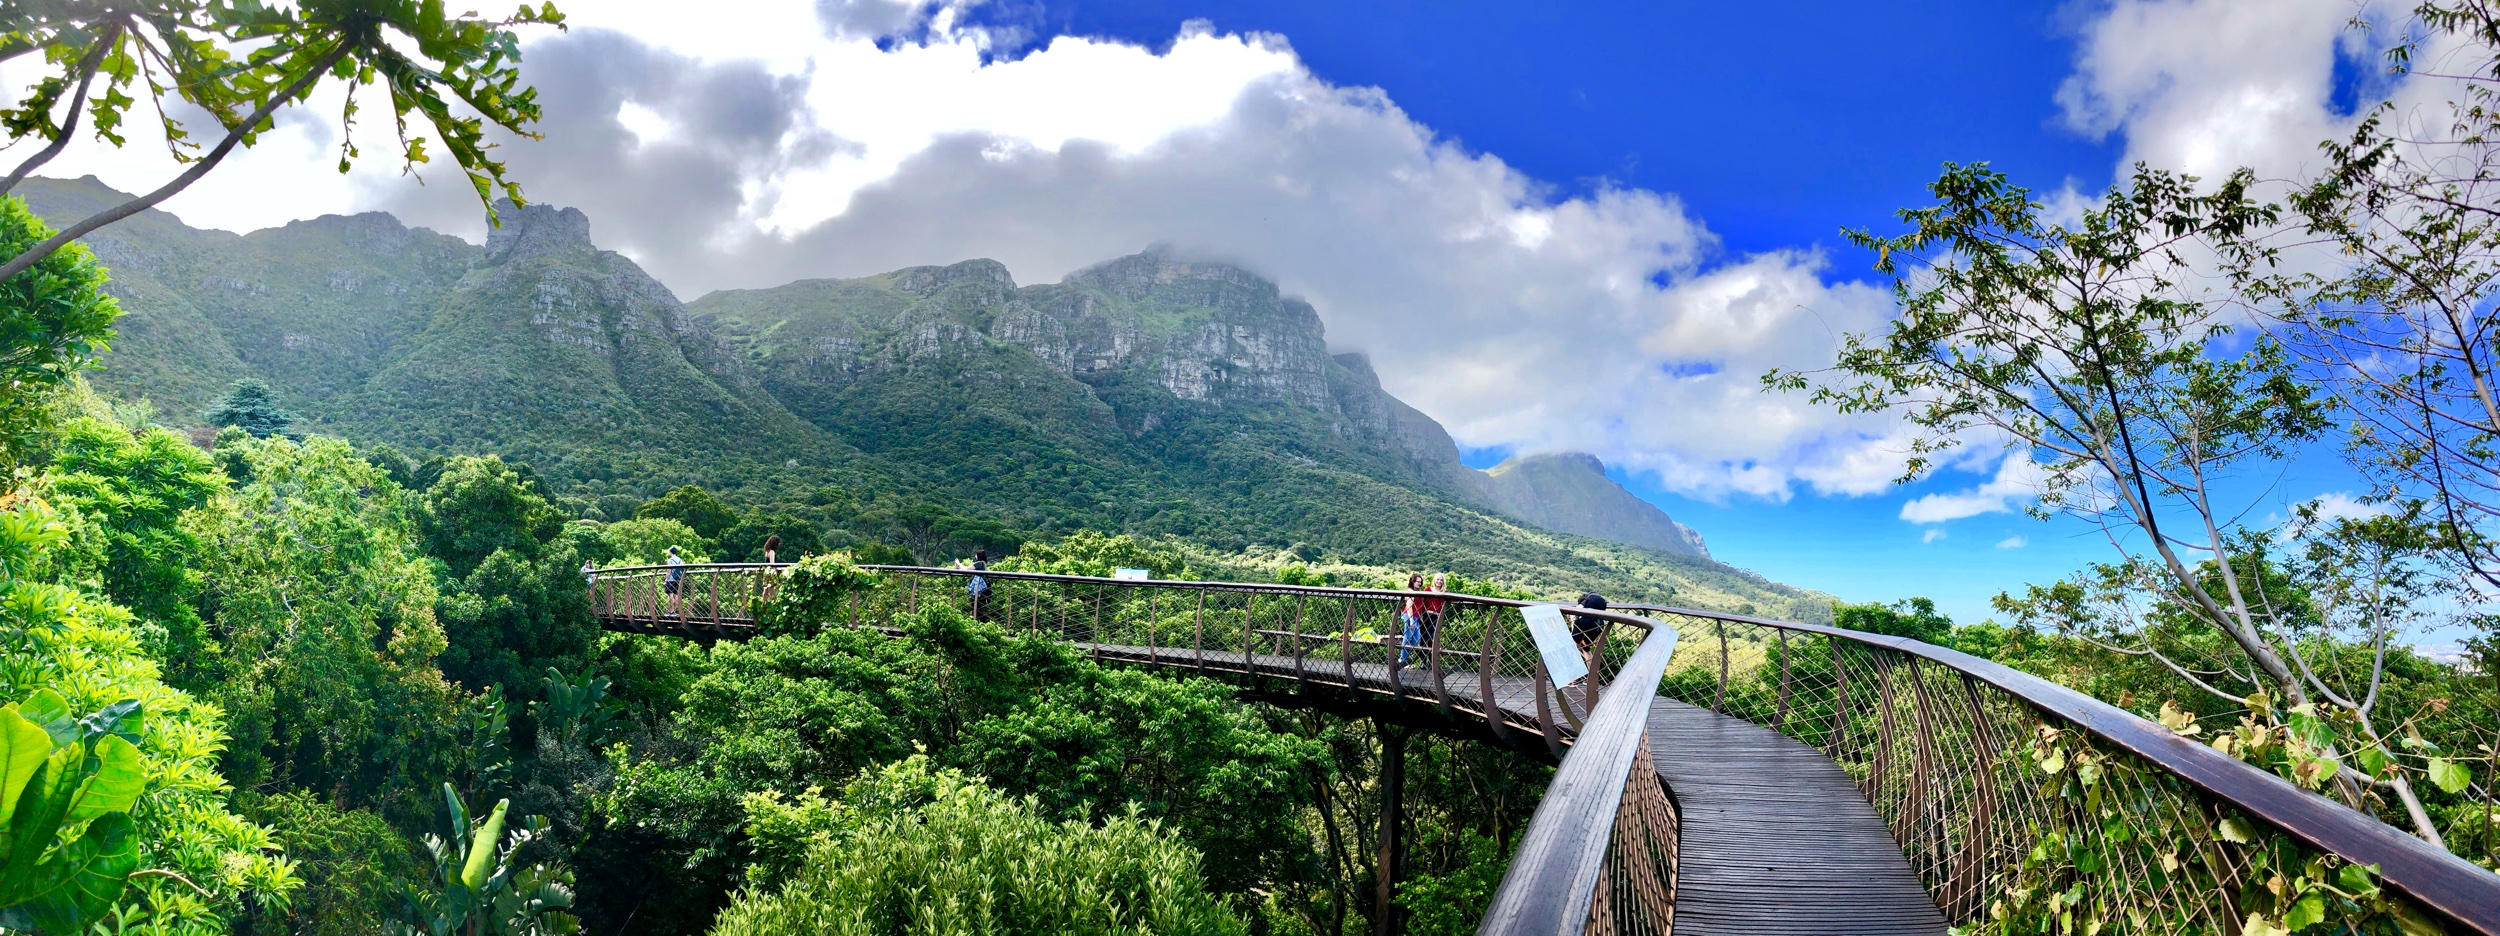 Panorama view of Boomslang Tree Top Walk Kirstenbosch Cape Town